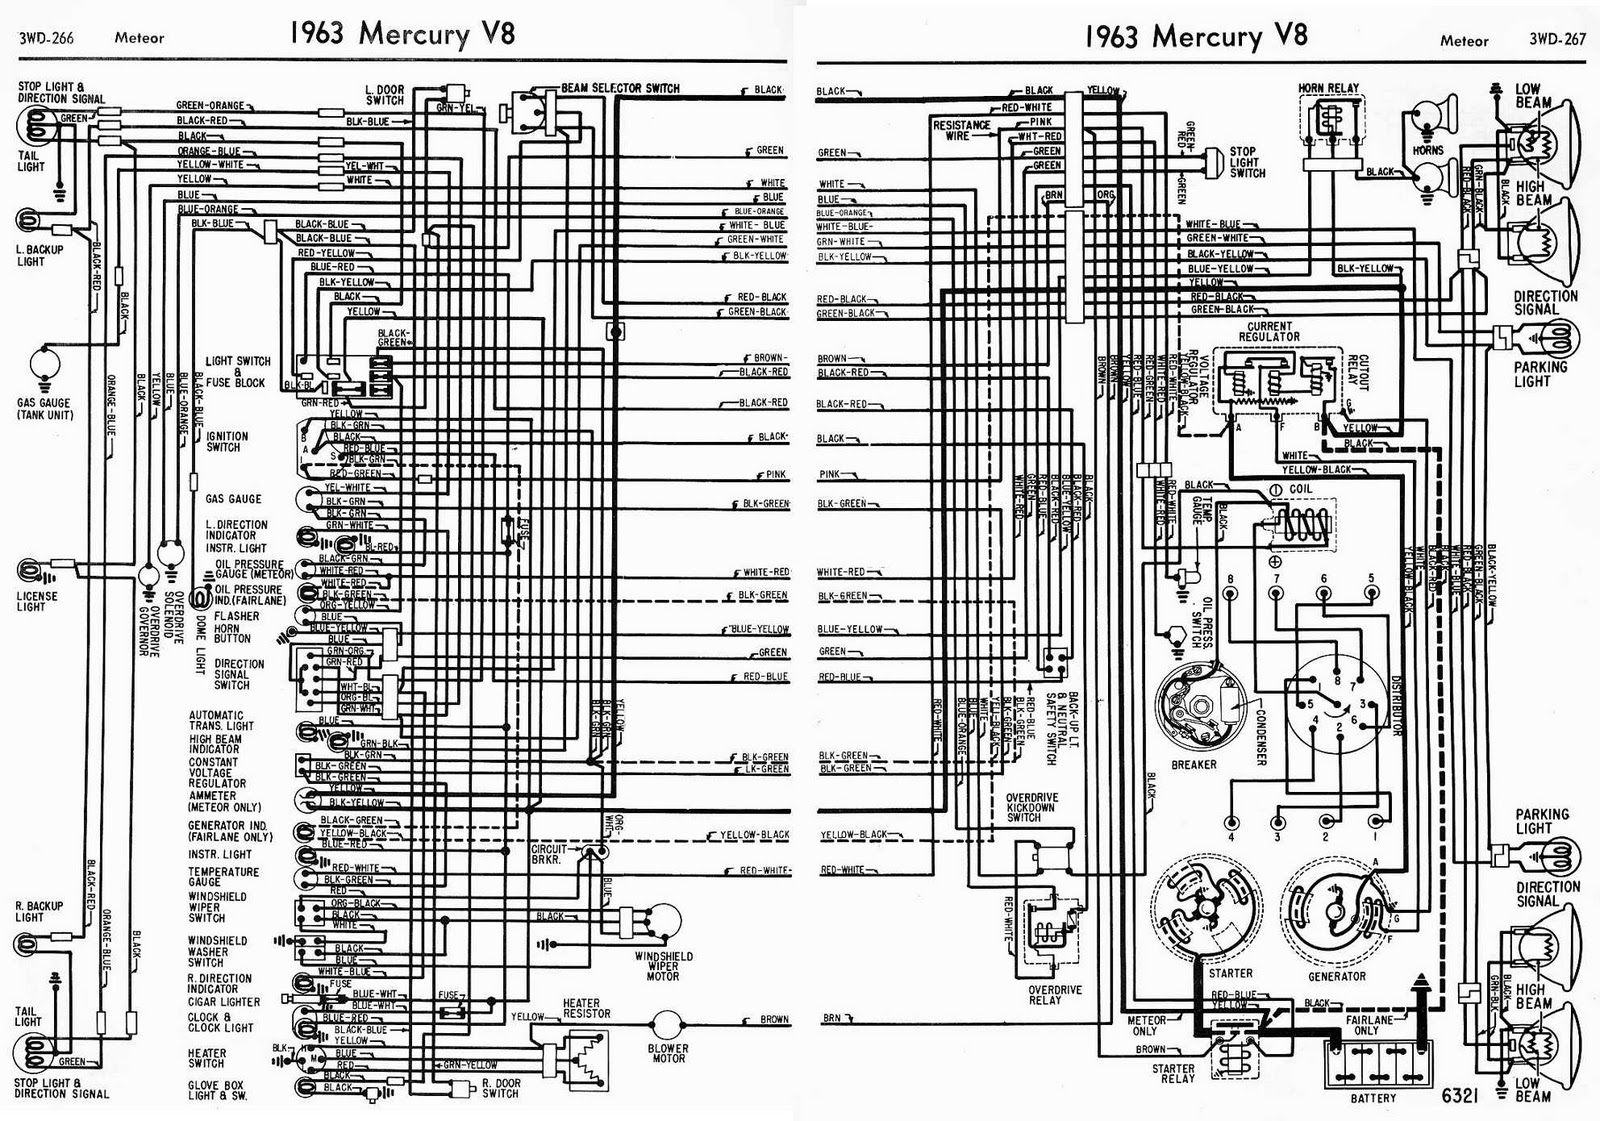 Old Fashioned 1980 Honda Cb750 Wiring Diagram Inspiration ...